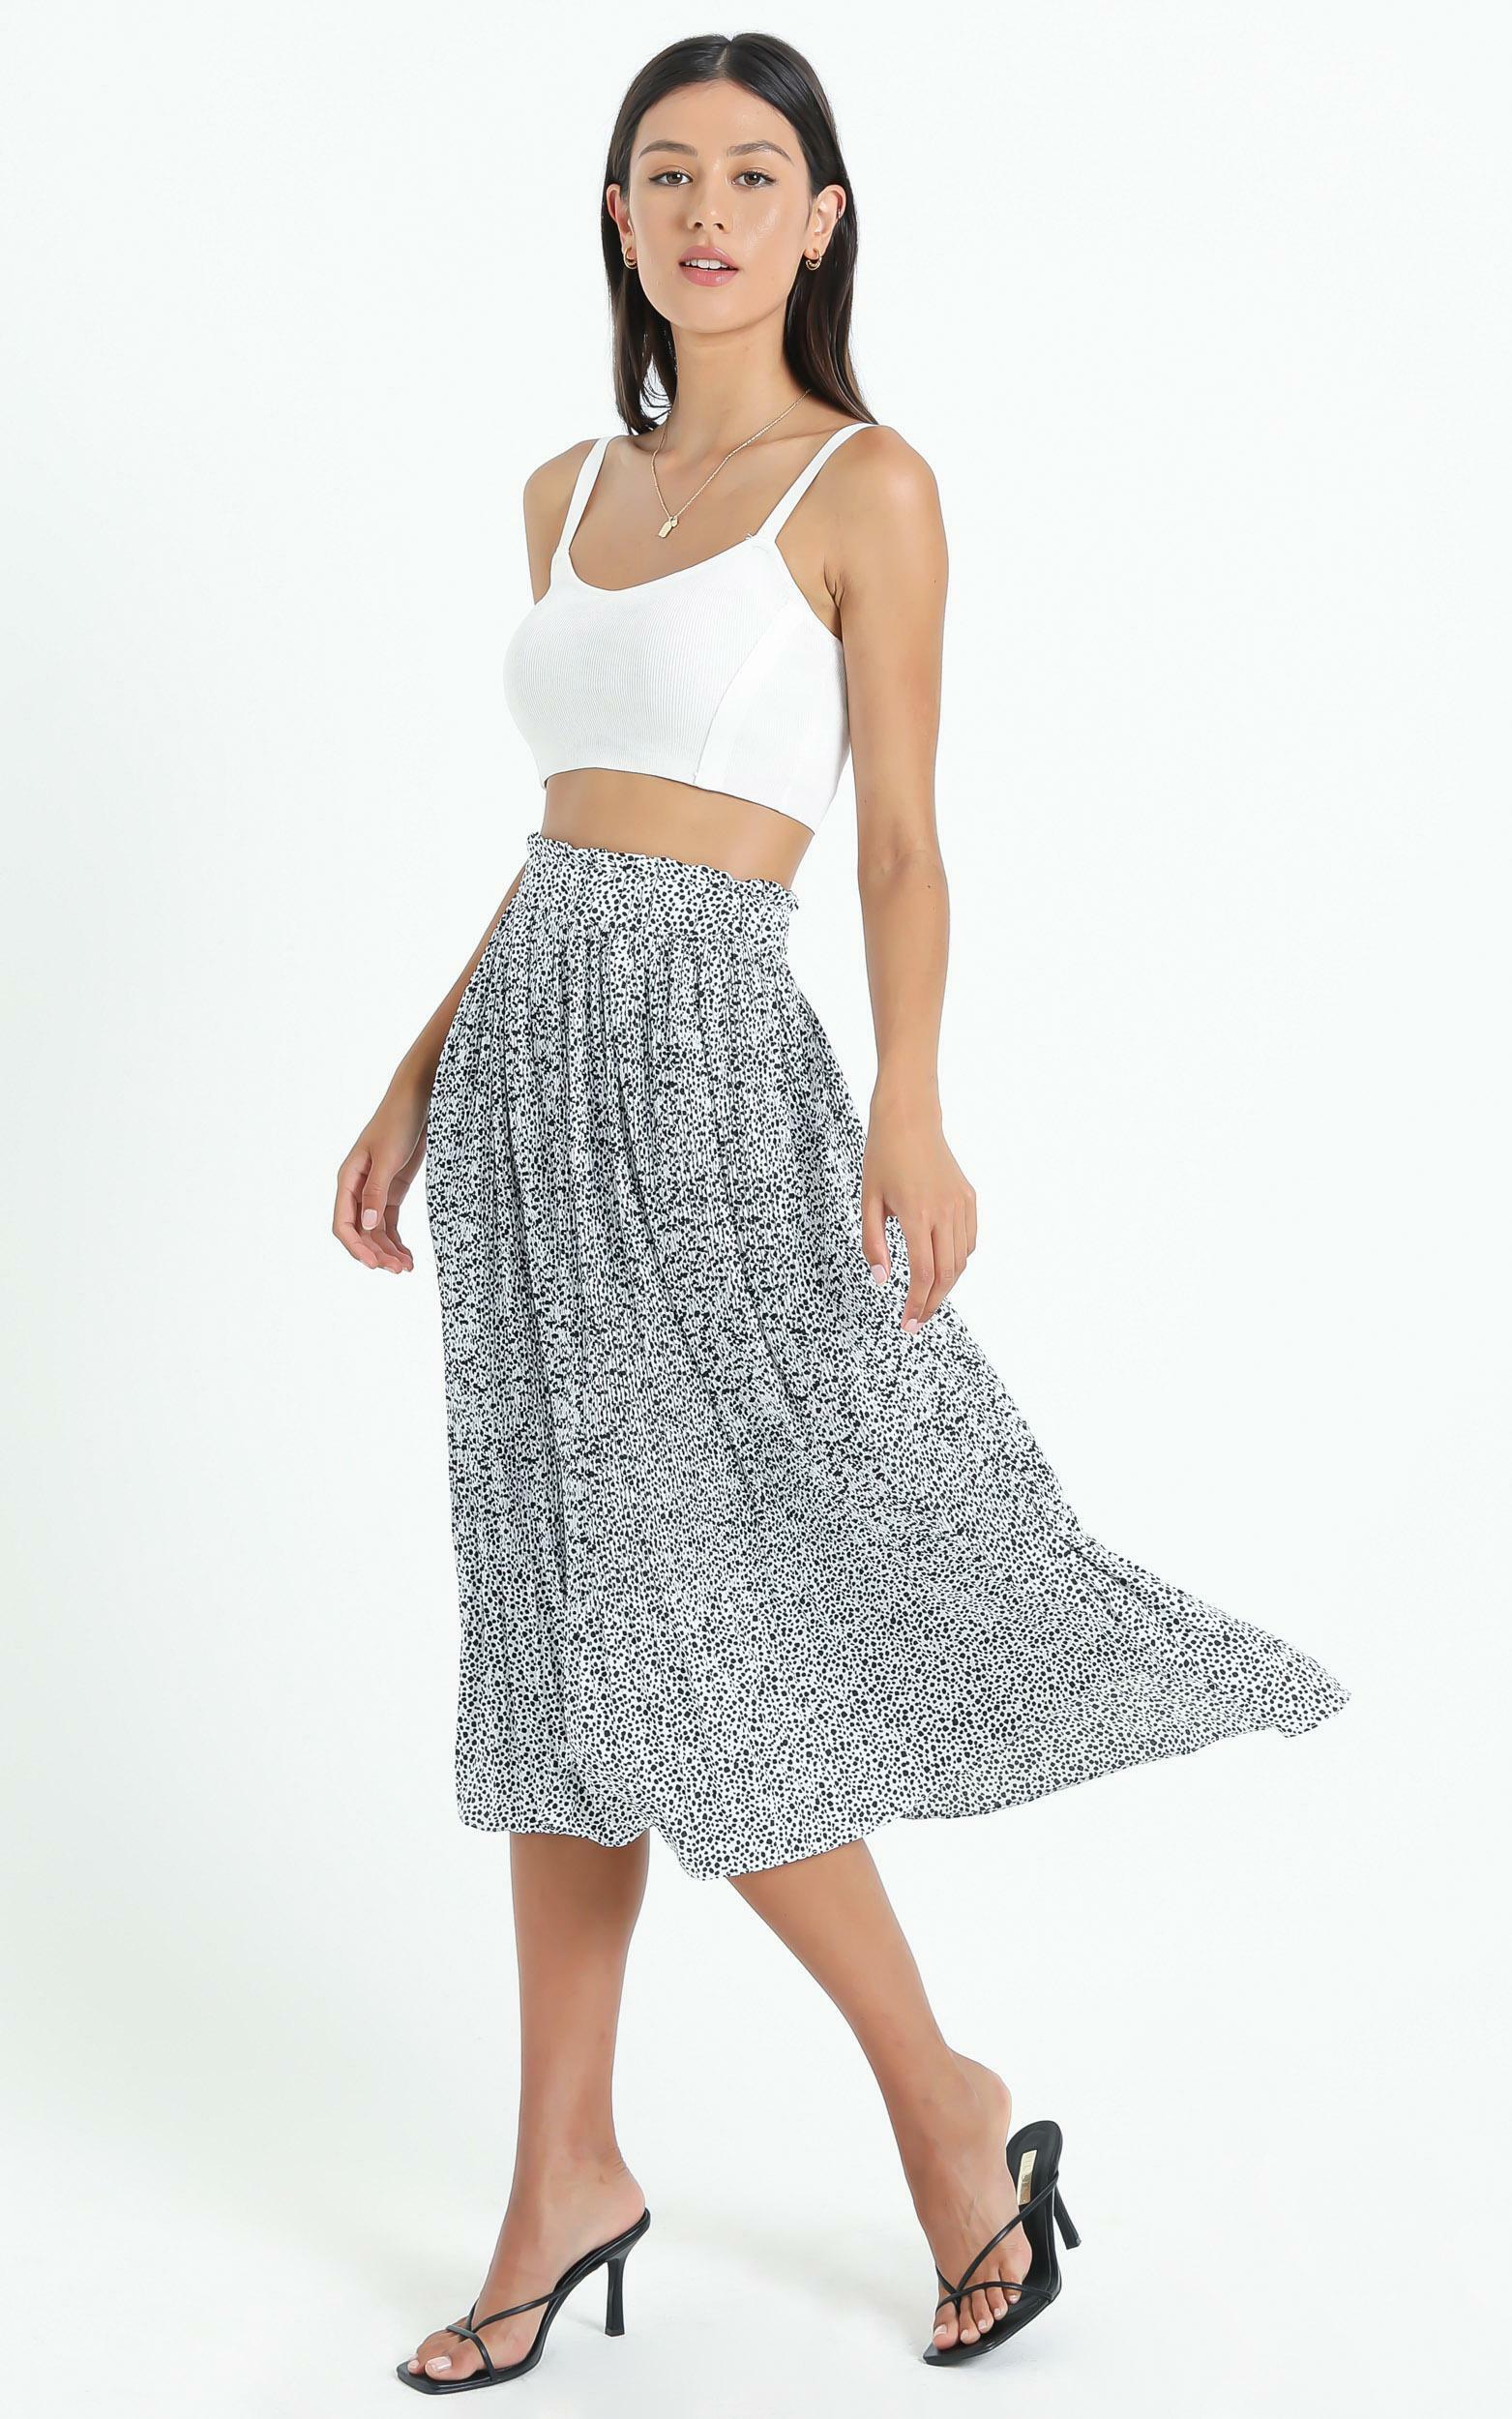 Not My Problem Skirt in black print - 14 (XL), Black, hi-res image number null